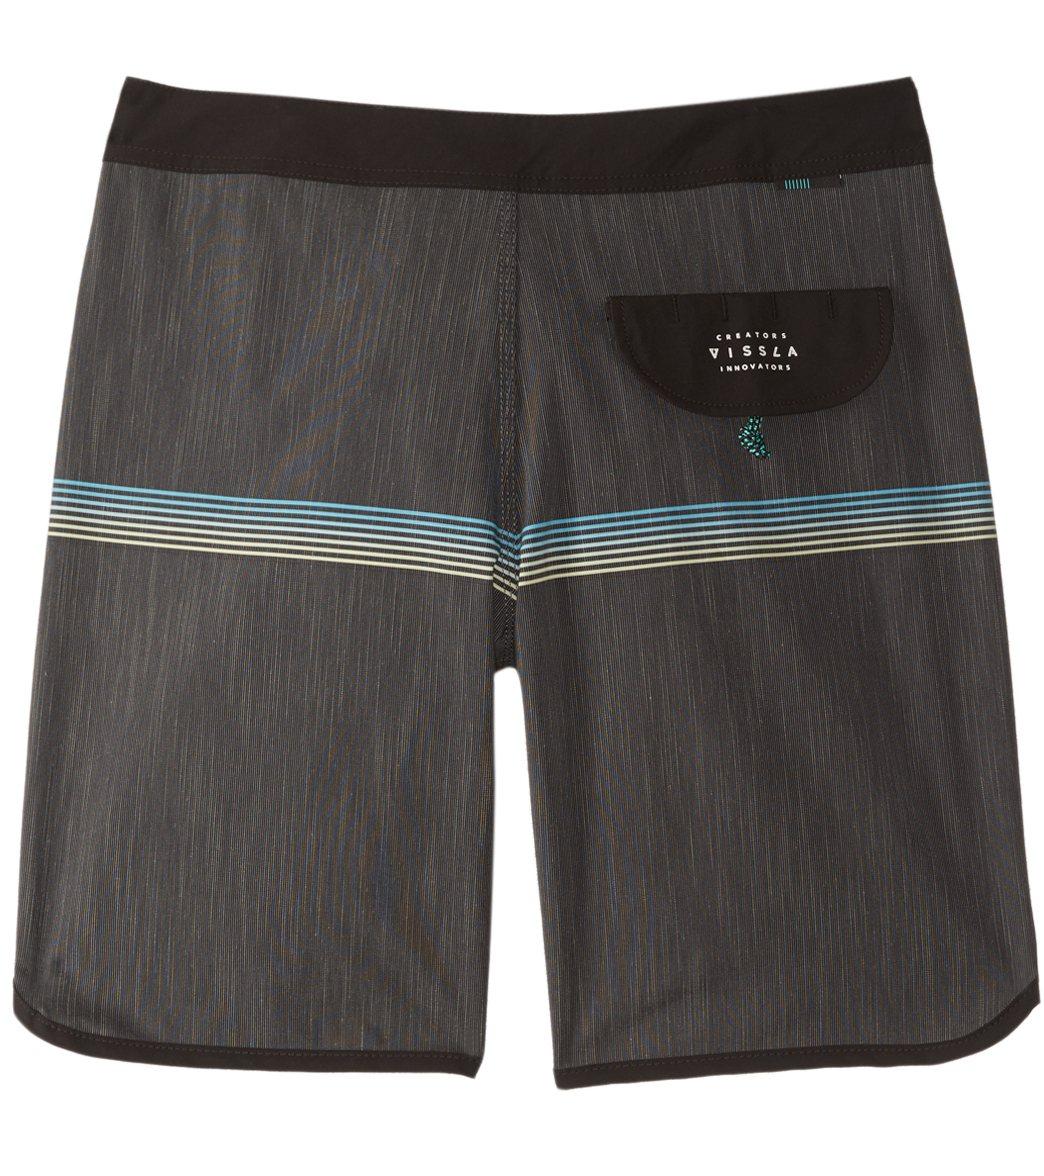 9715b519f6 Vissla Men's Dredges Boardshort at SwimOutlet.com - Free Shipping